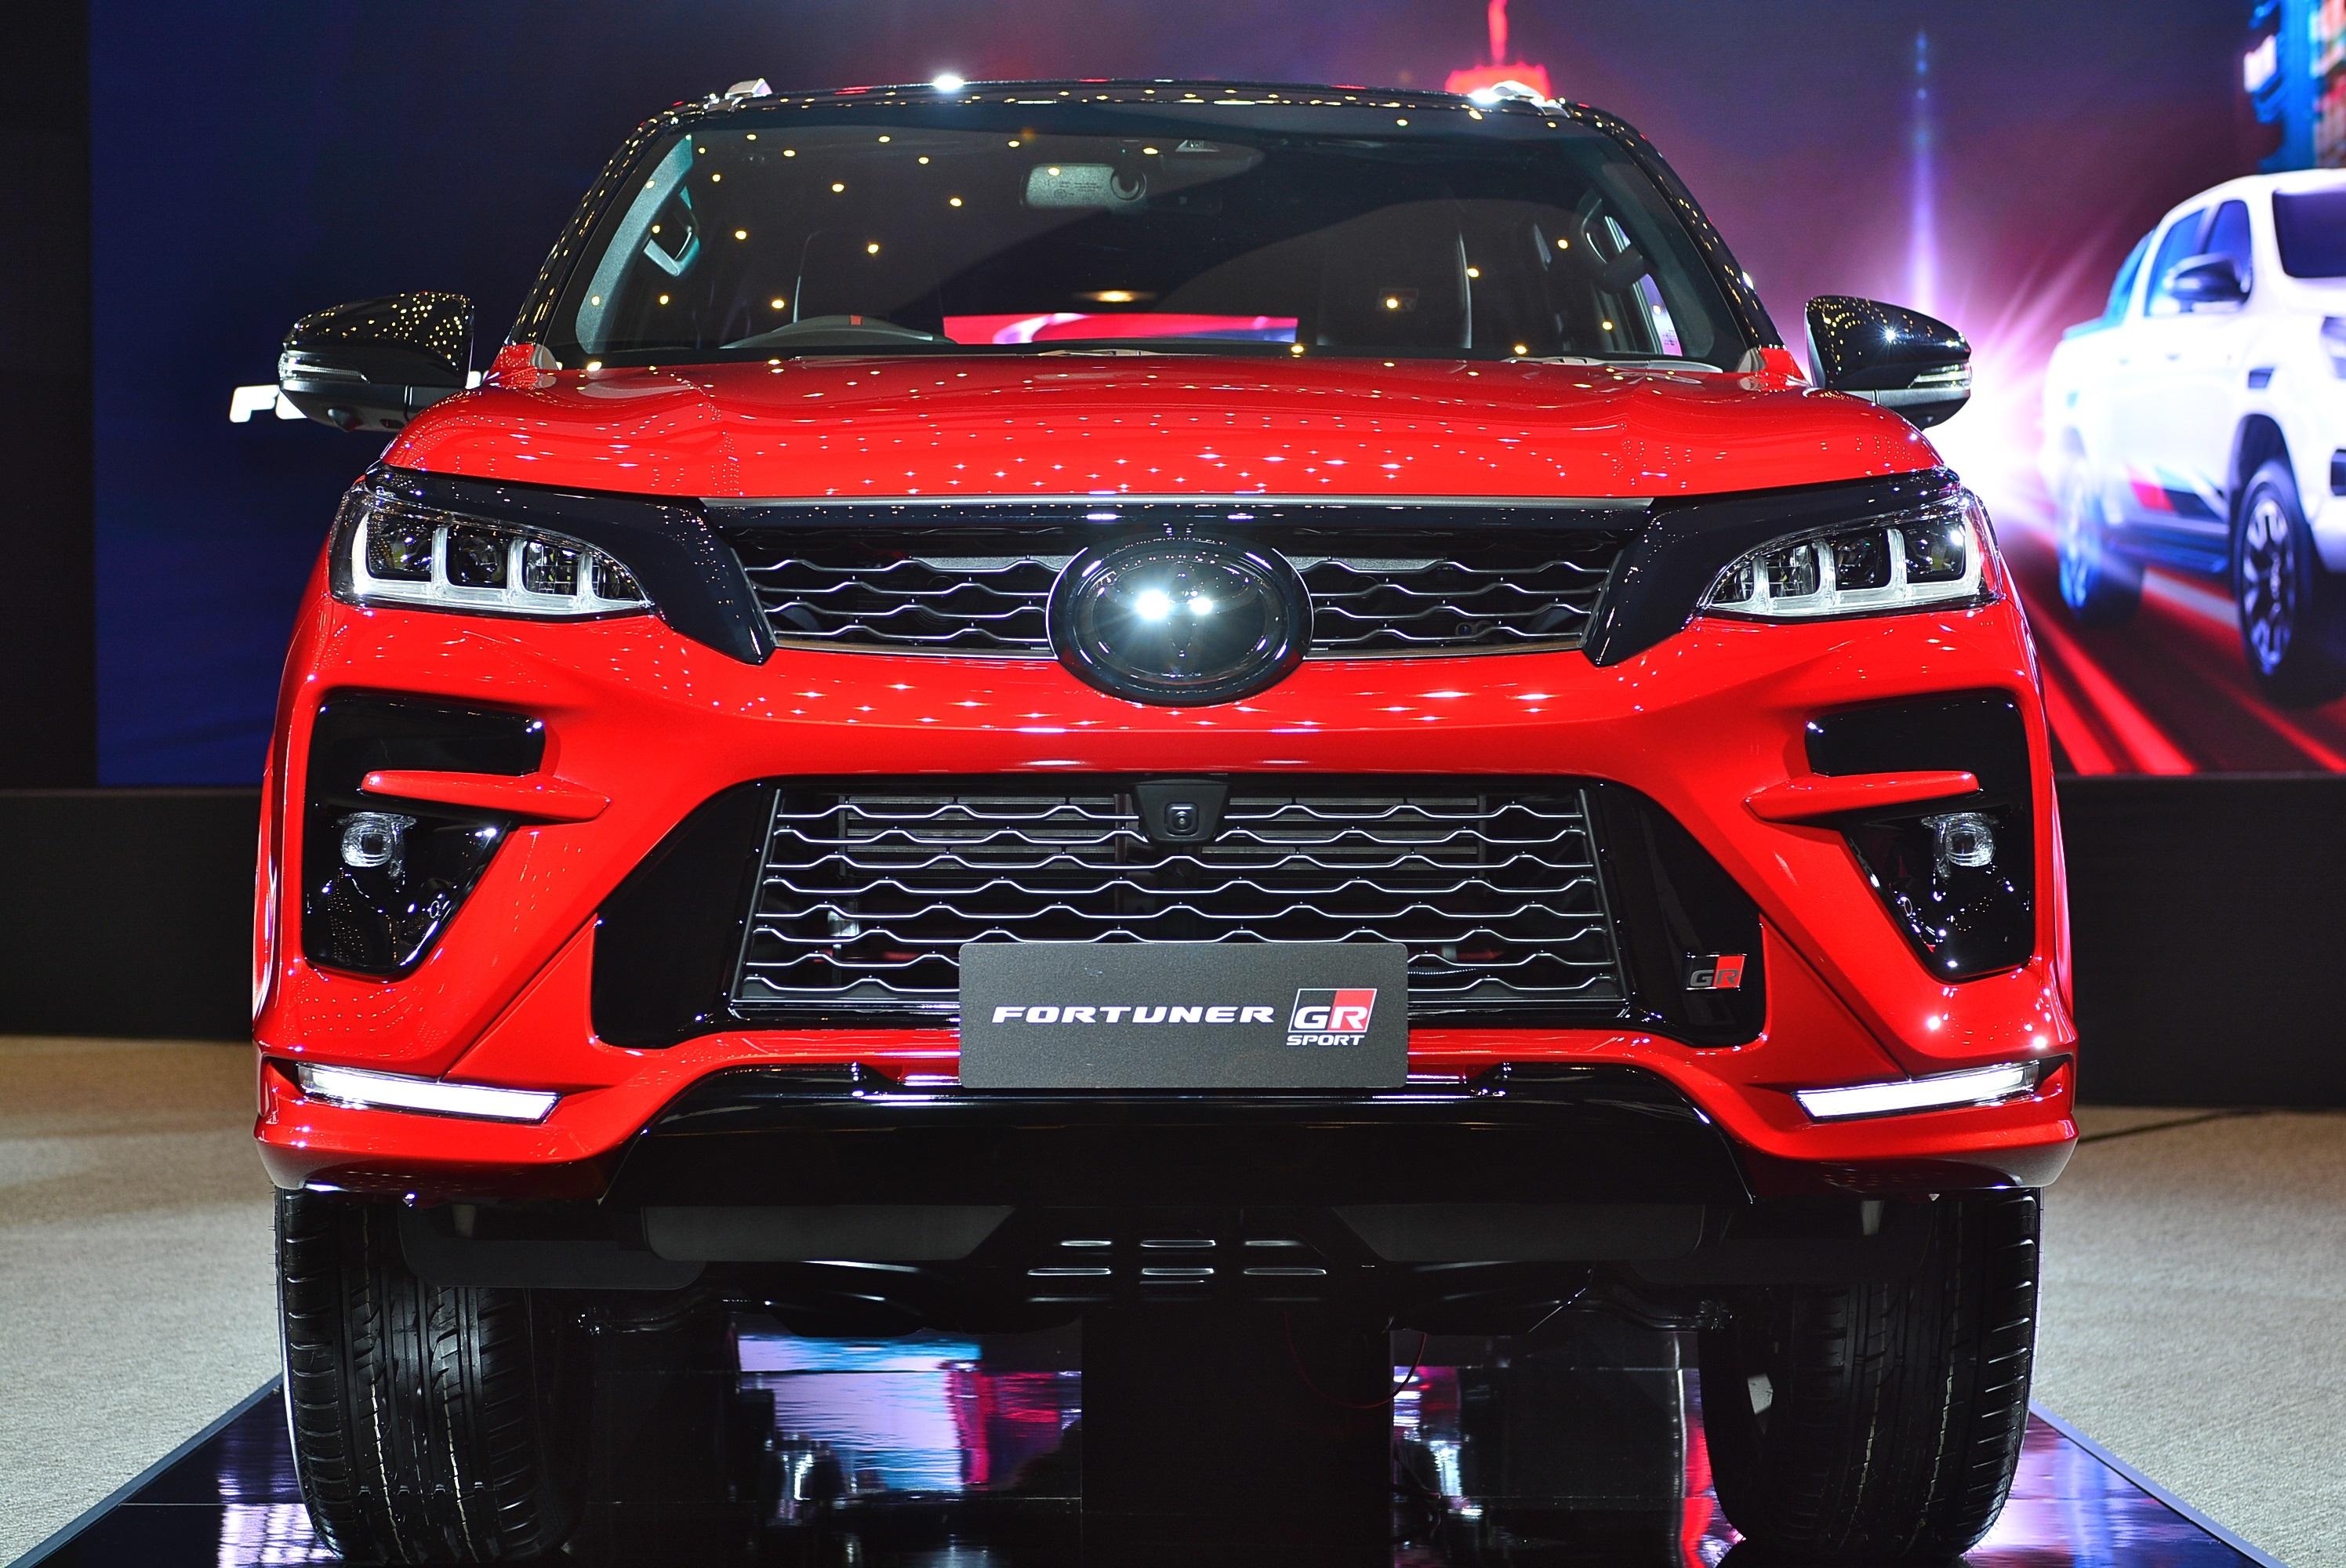 Review Toyota Fortuner GR Sport Modellista AutoinfoOnline (13)